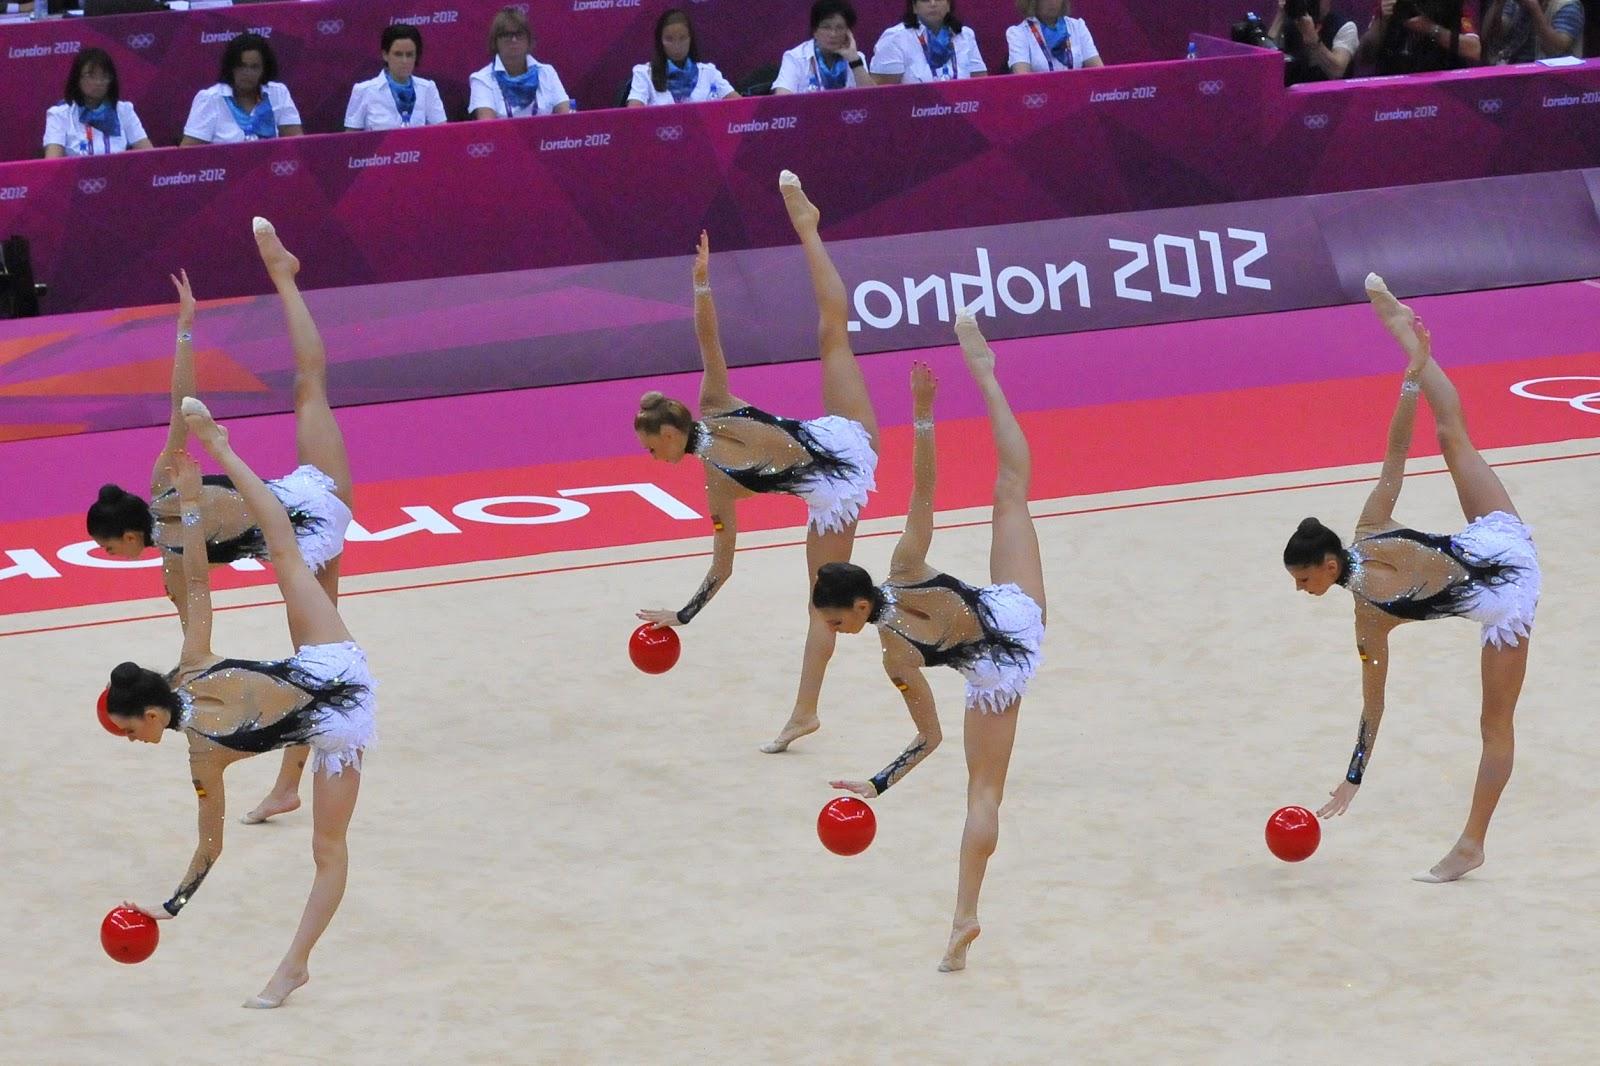 London 2012 Olympic Photo Blog: Rhythmic Gymnastics - Day 2